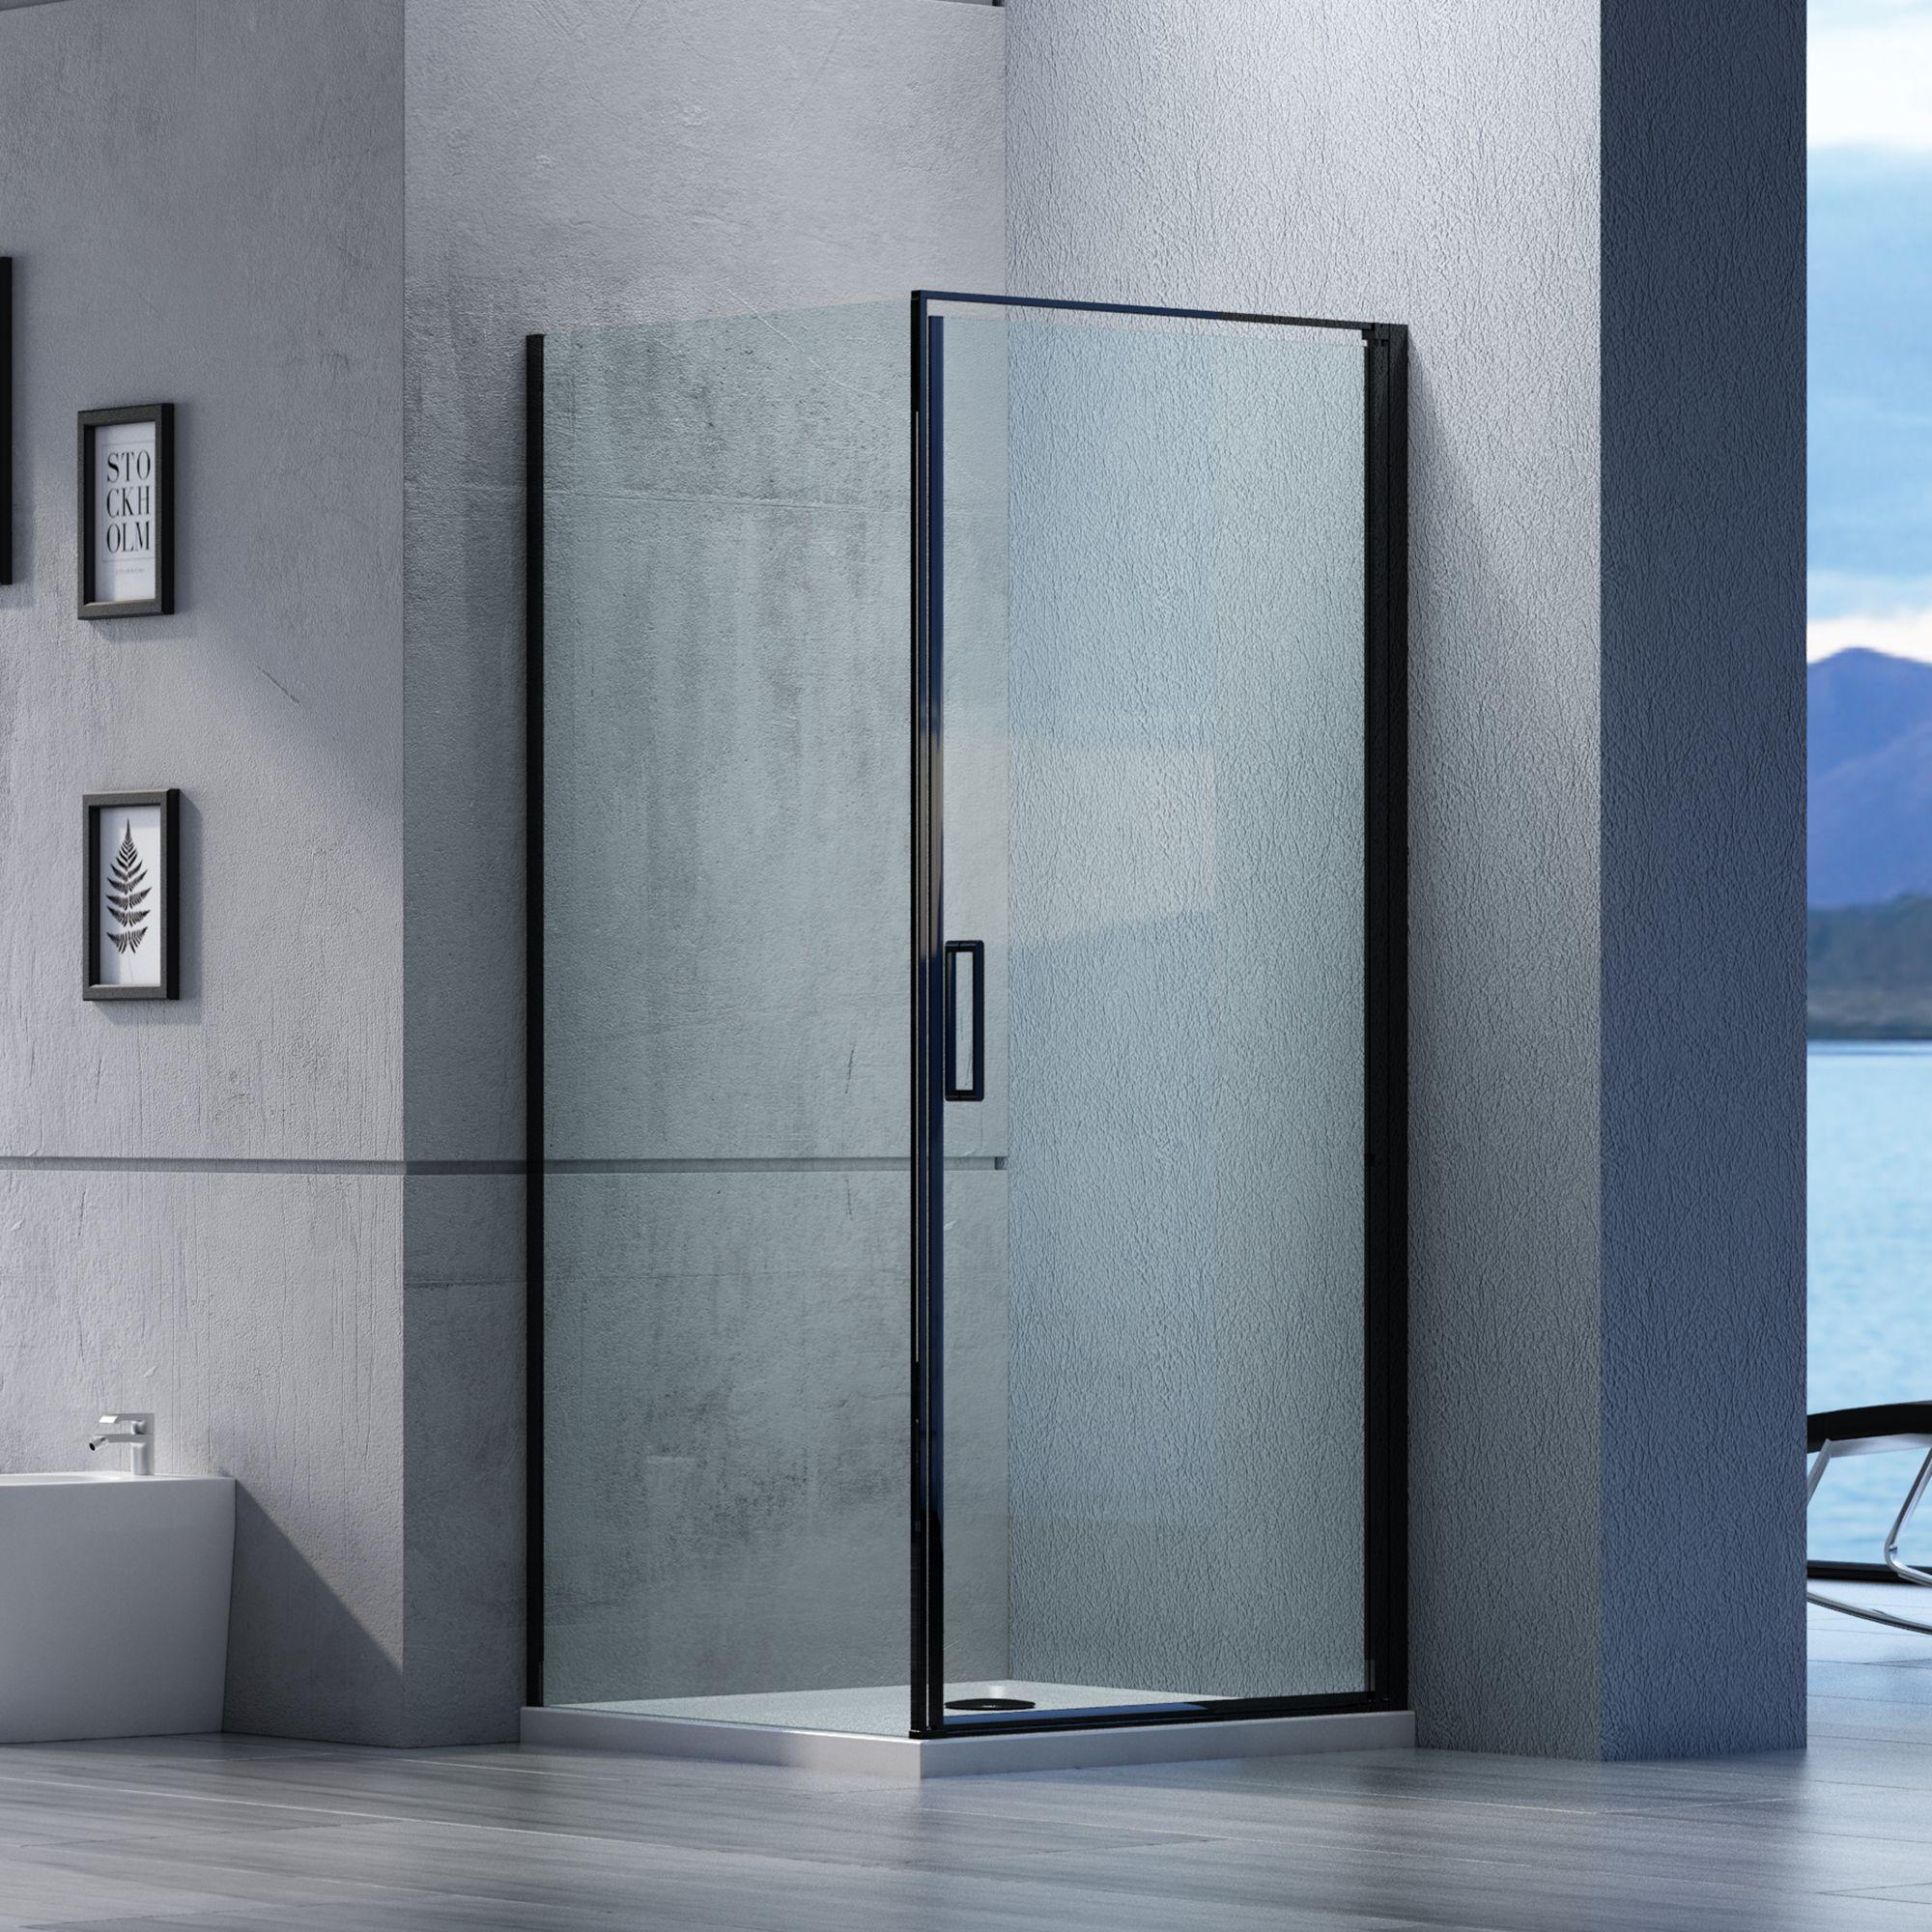 Duschkabine Eckdusche Nano 6mm Echtglas Ex416s Schwarz 100 X 100 X 195 Cm Badewelt Duschkabine Eckdusche Eckduschen Duschkabine Dusche